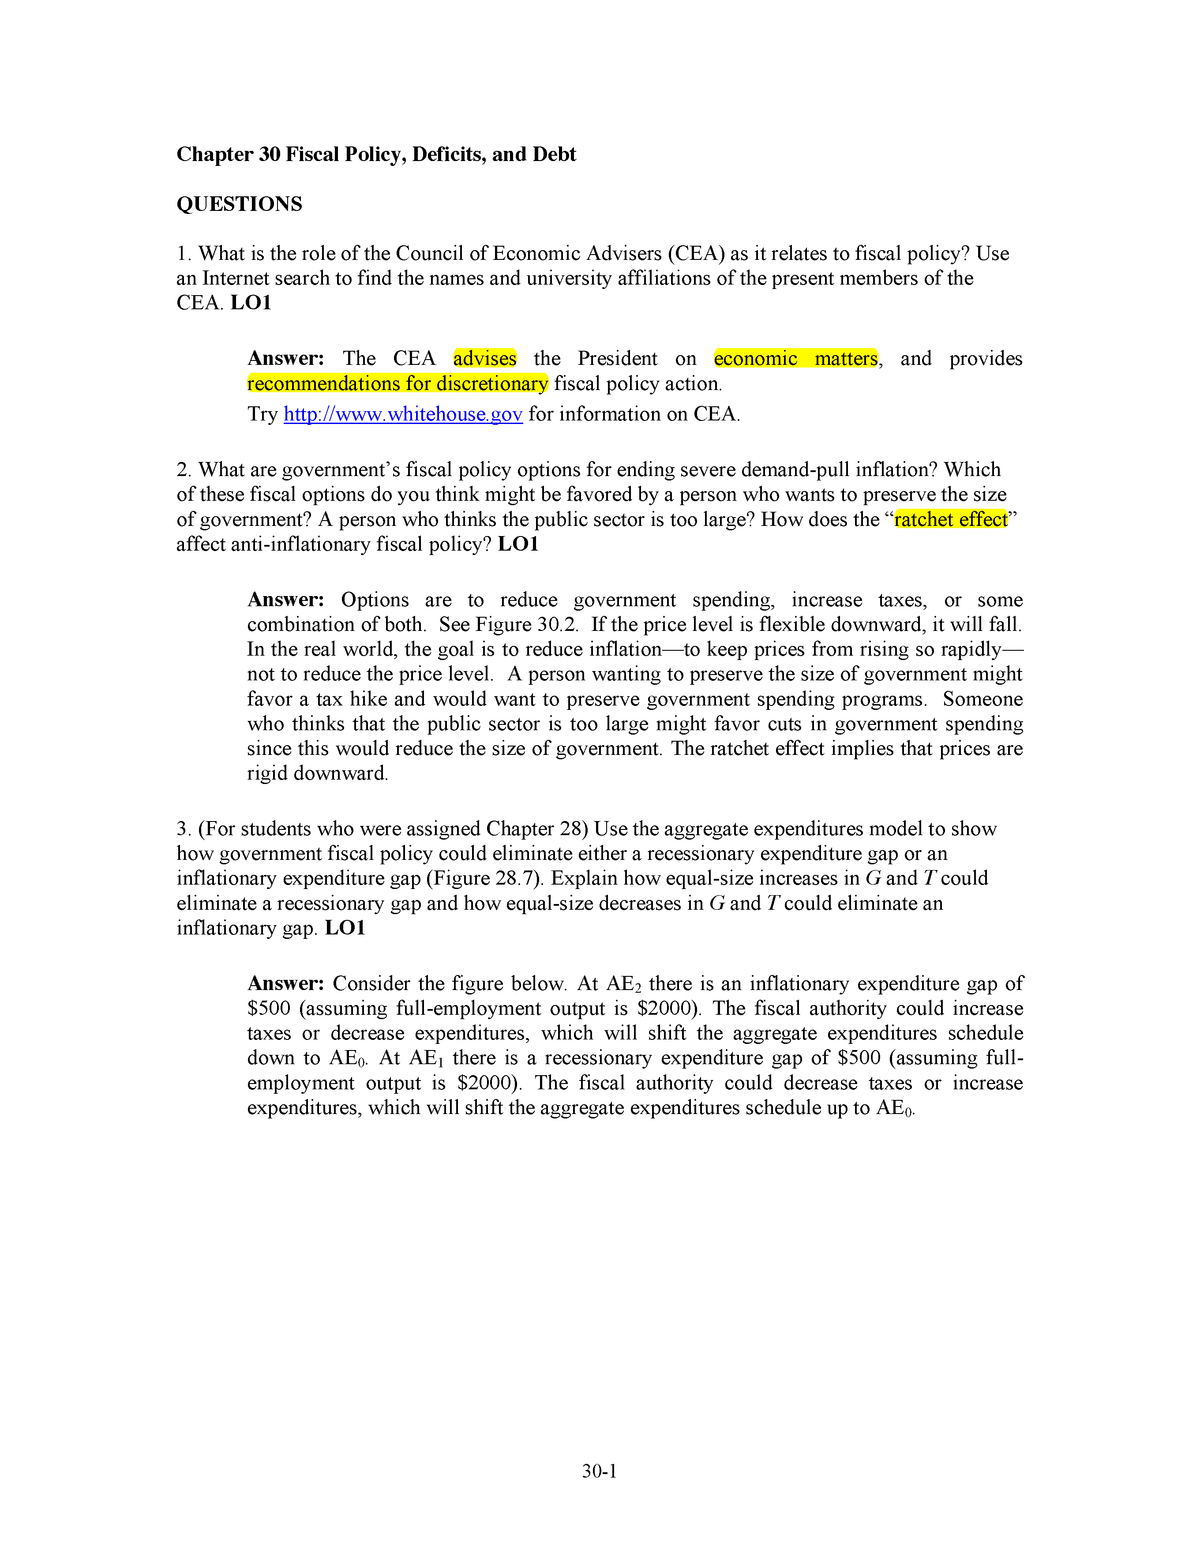 Chap030-Solutions - Principles of Macroeconomics: Solutions